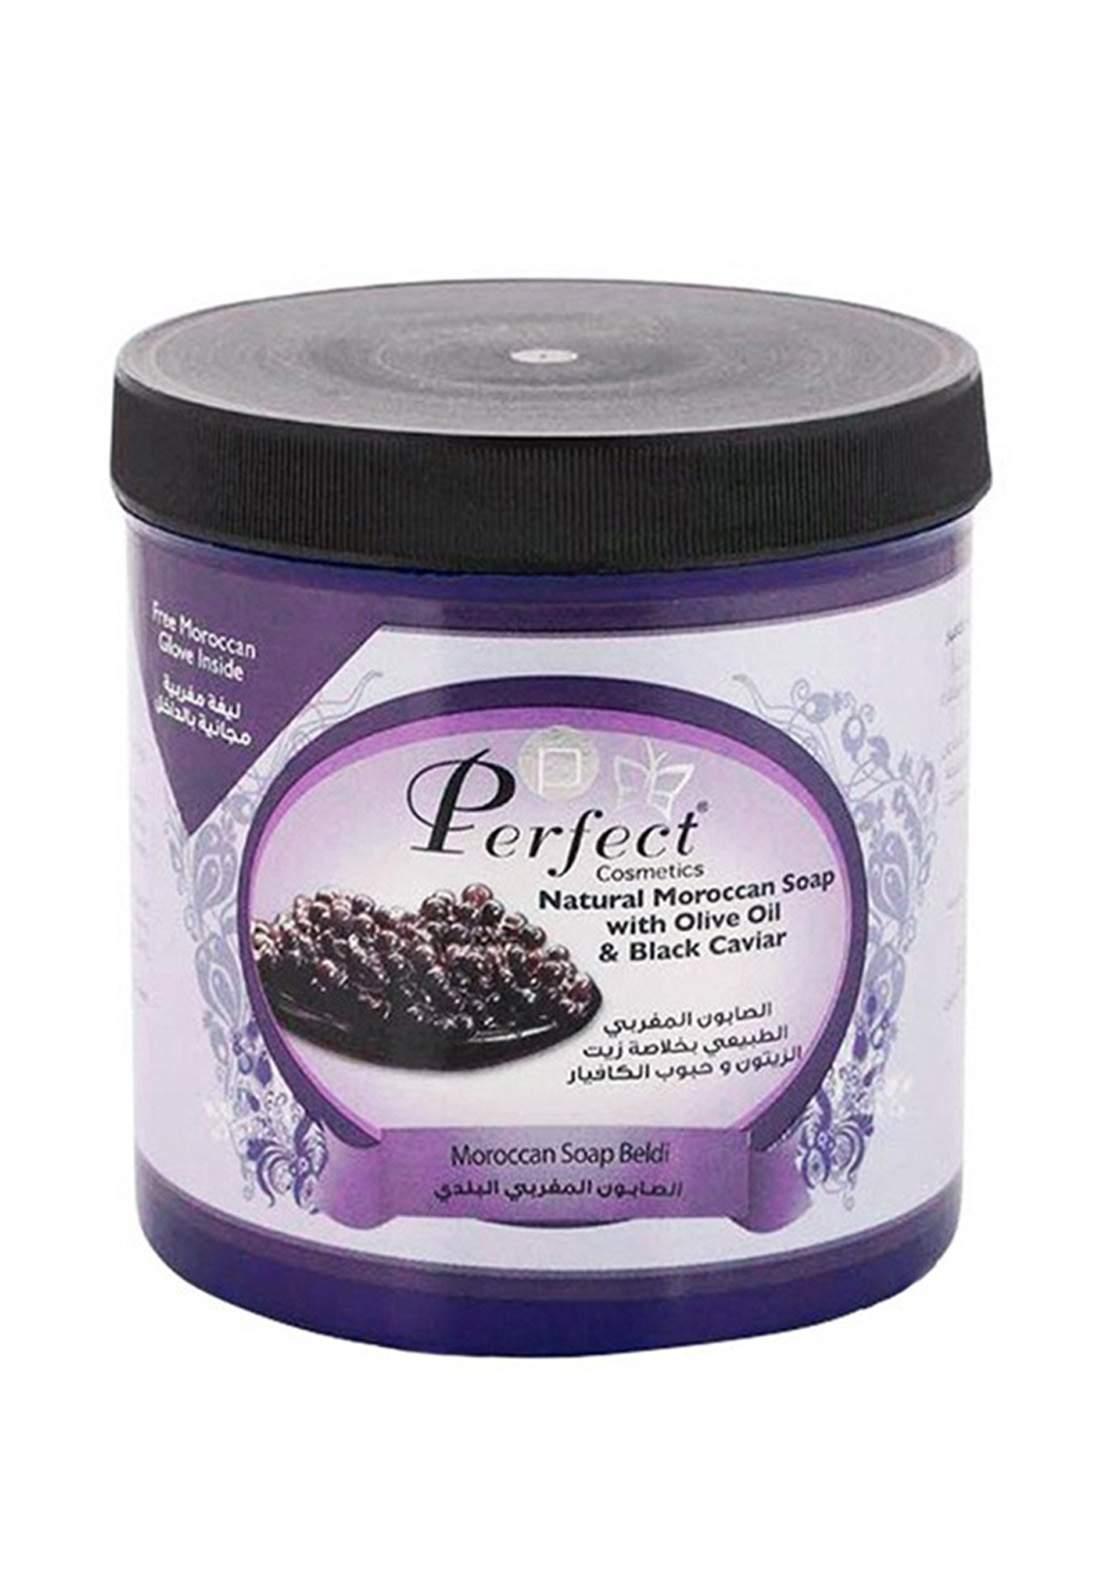 Perfect Cosmetics Moroccan Soap With Olive Oil & Black Caviar 1000ml صابون مغربي